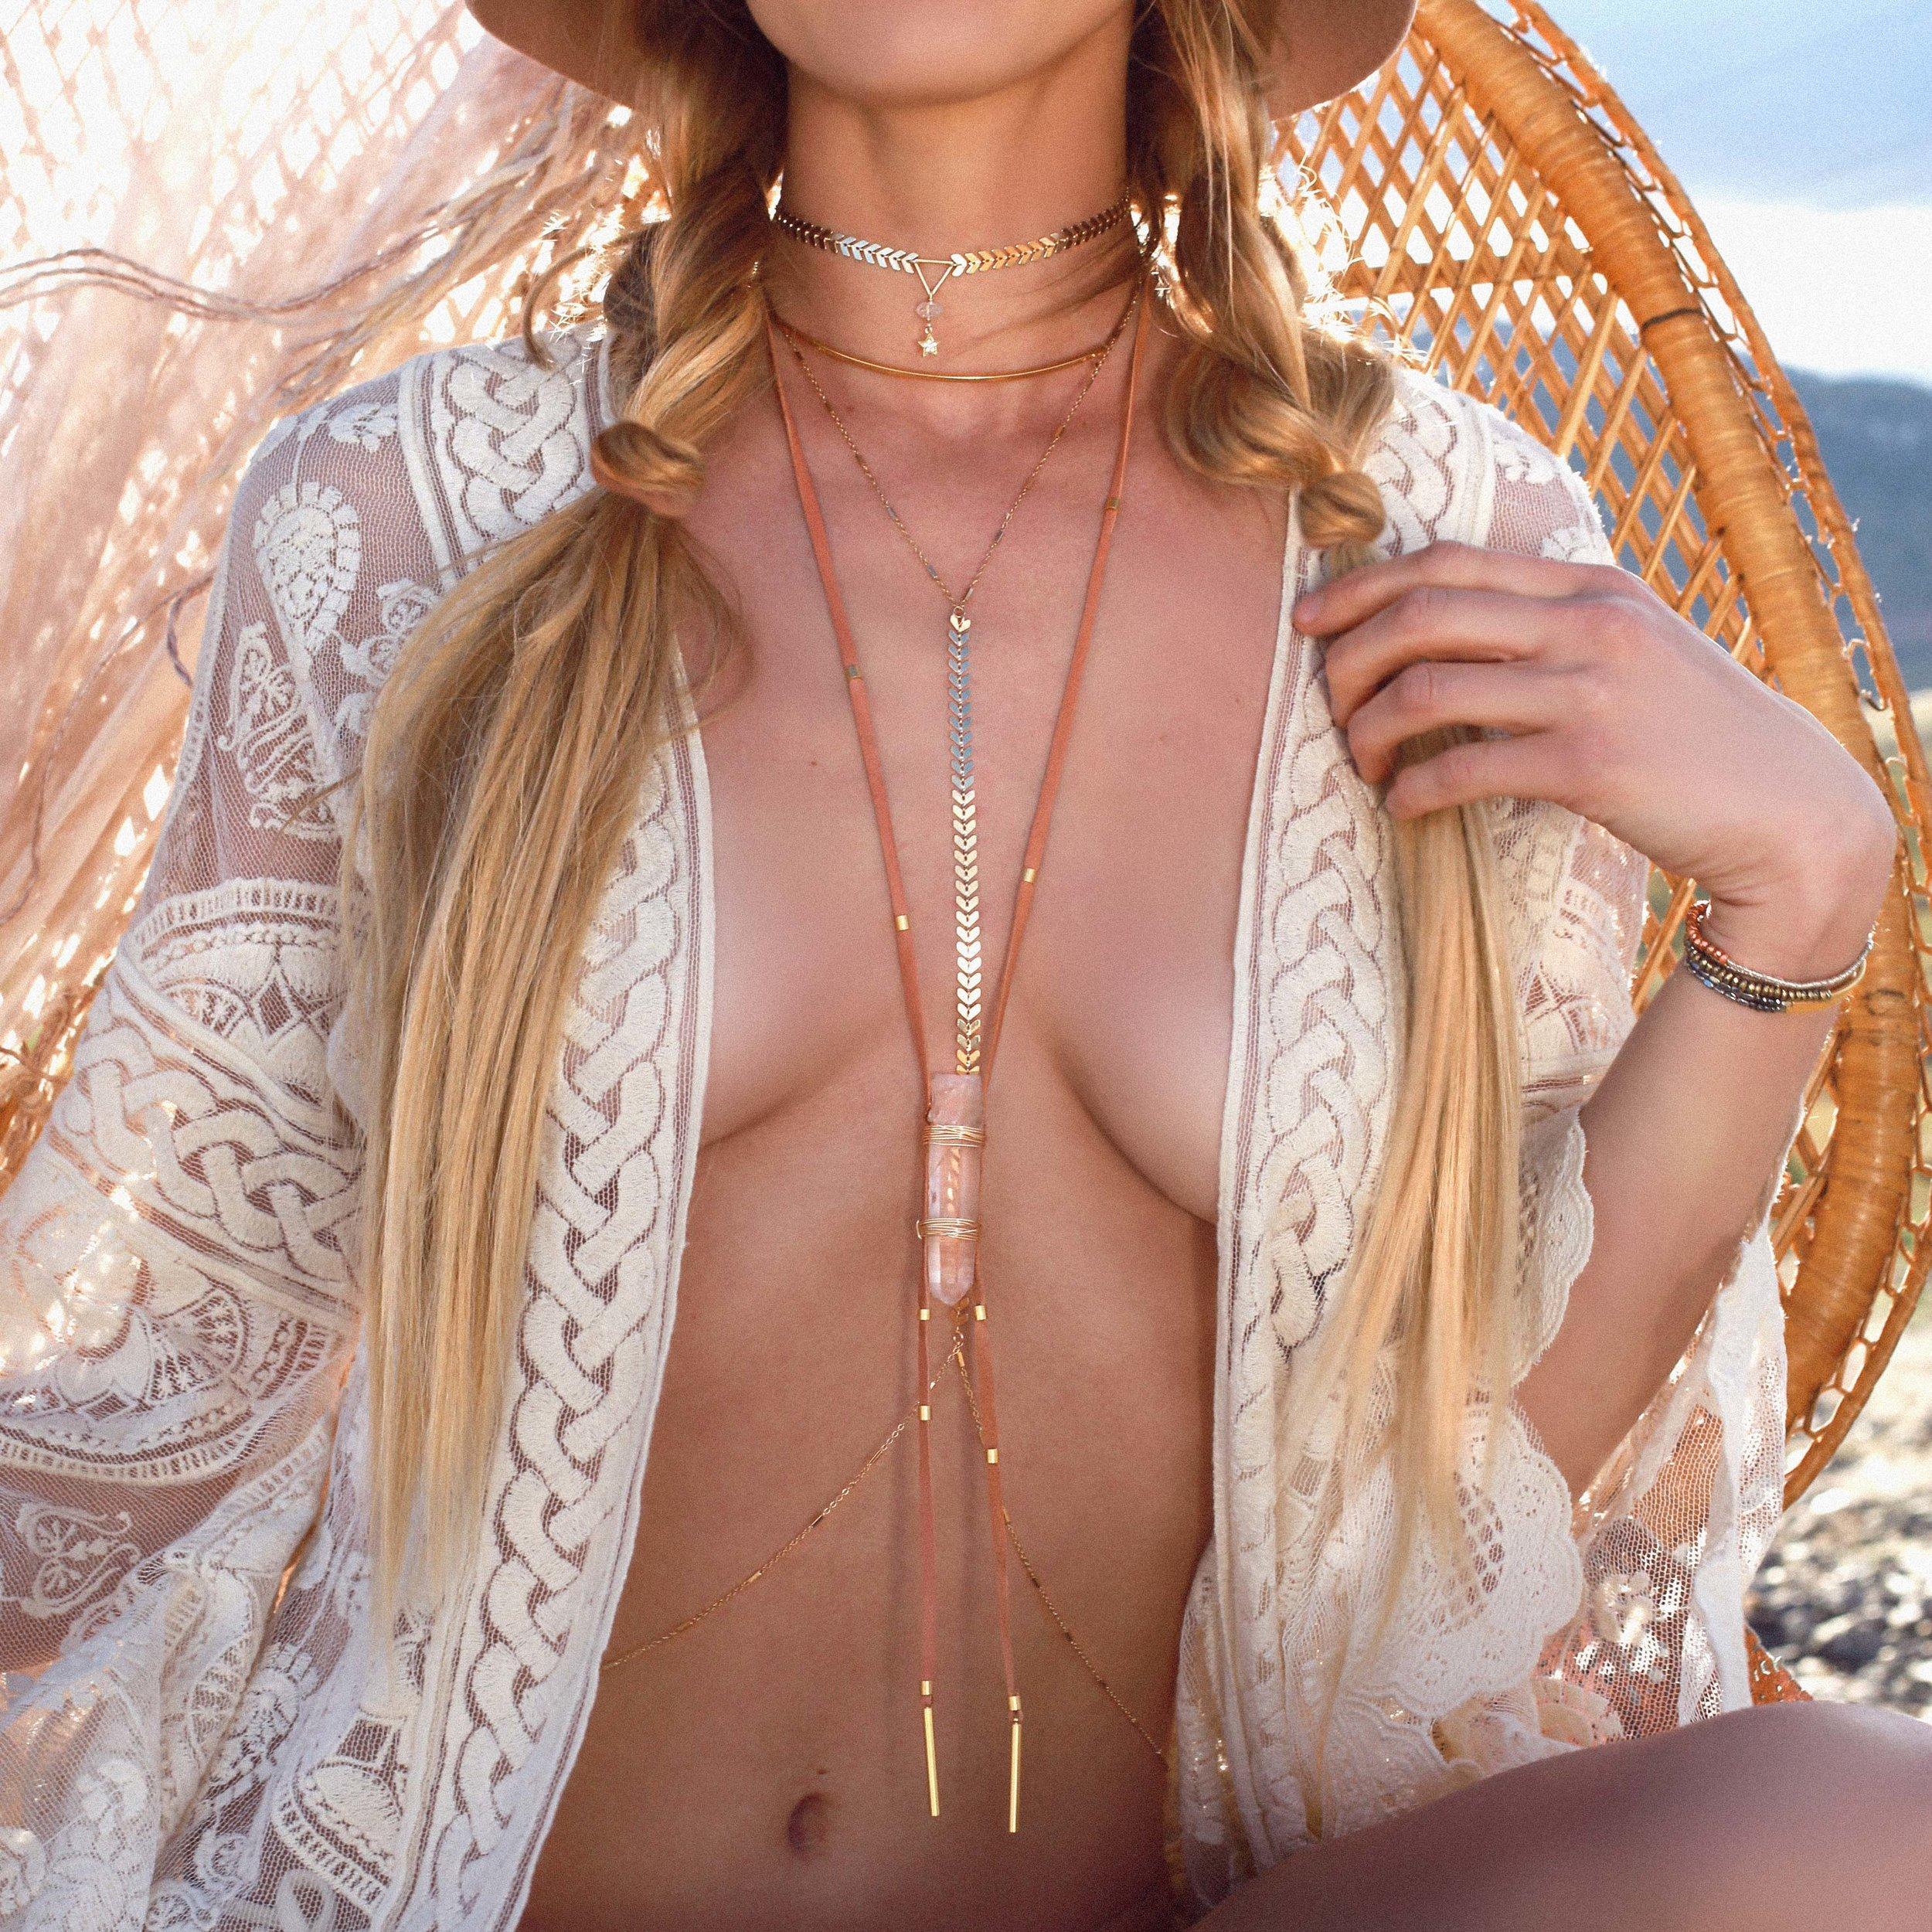 COLORADO GYPSY DREAMIN' - Jewelry Photo Shoot Story shot by Alyssa Risley - IG @alyssarisley